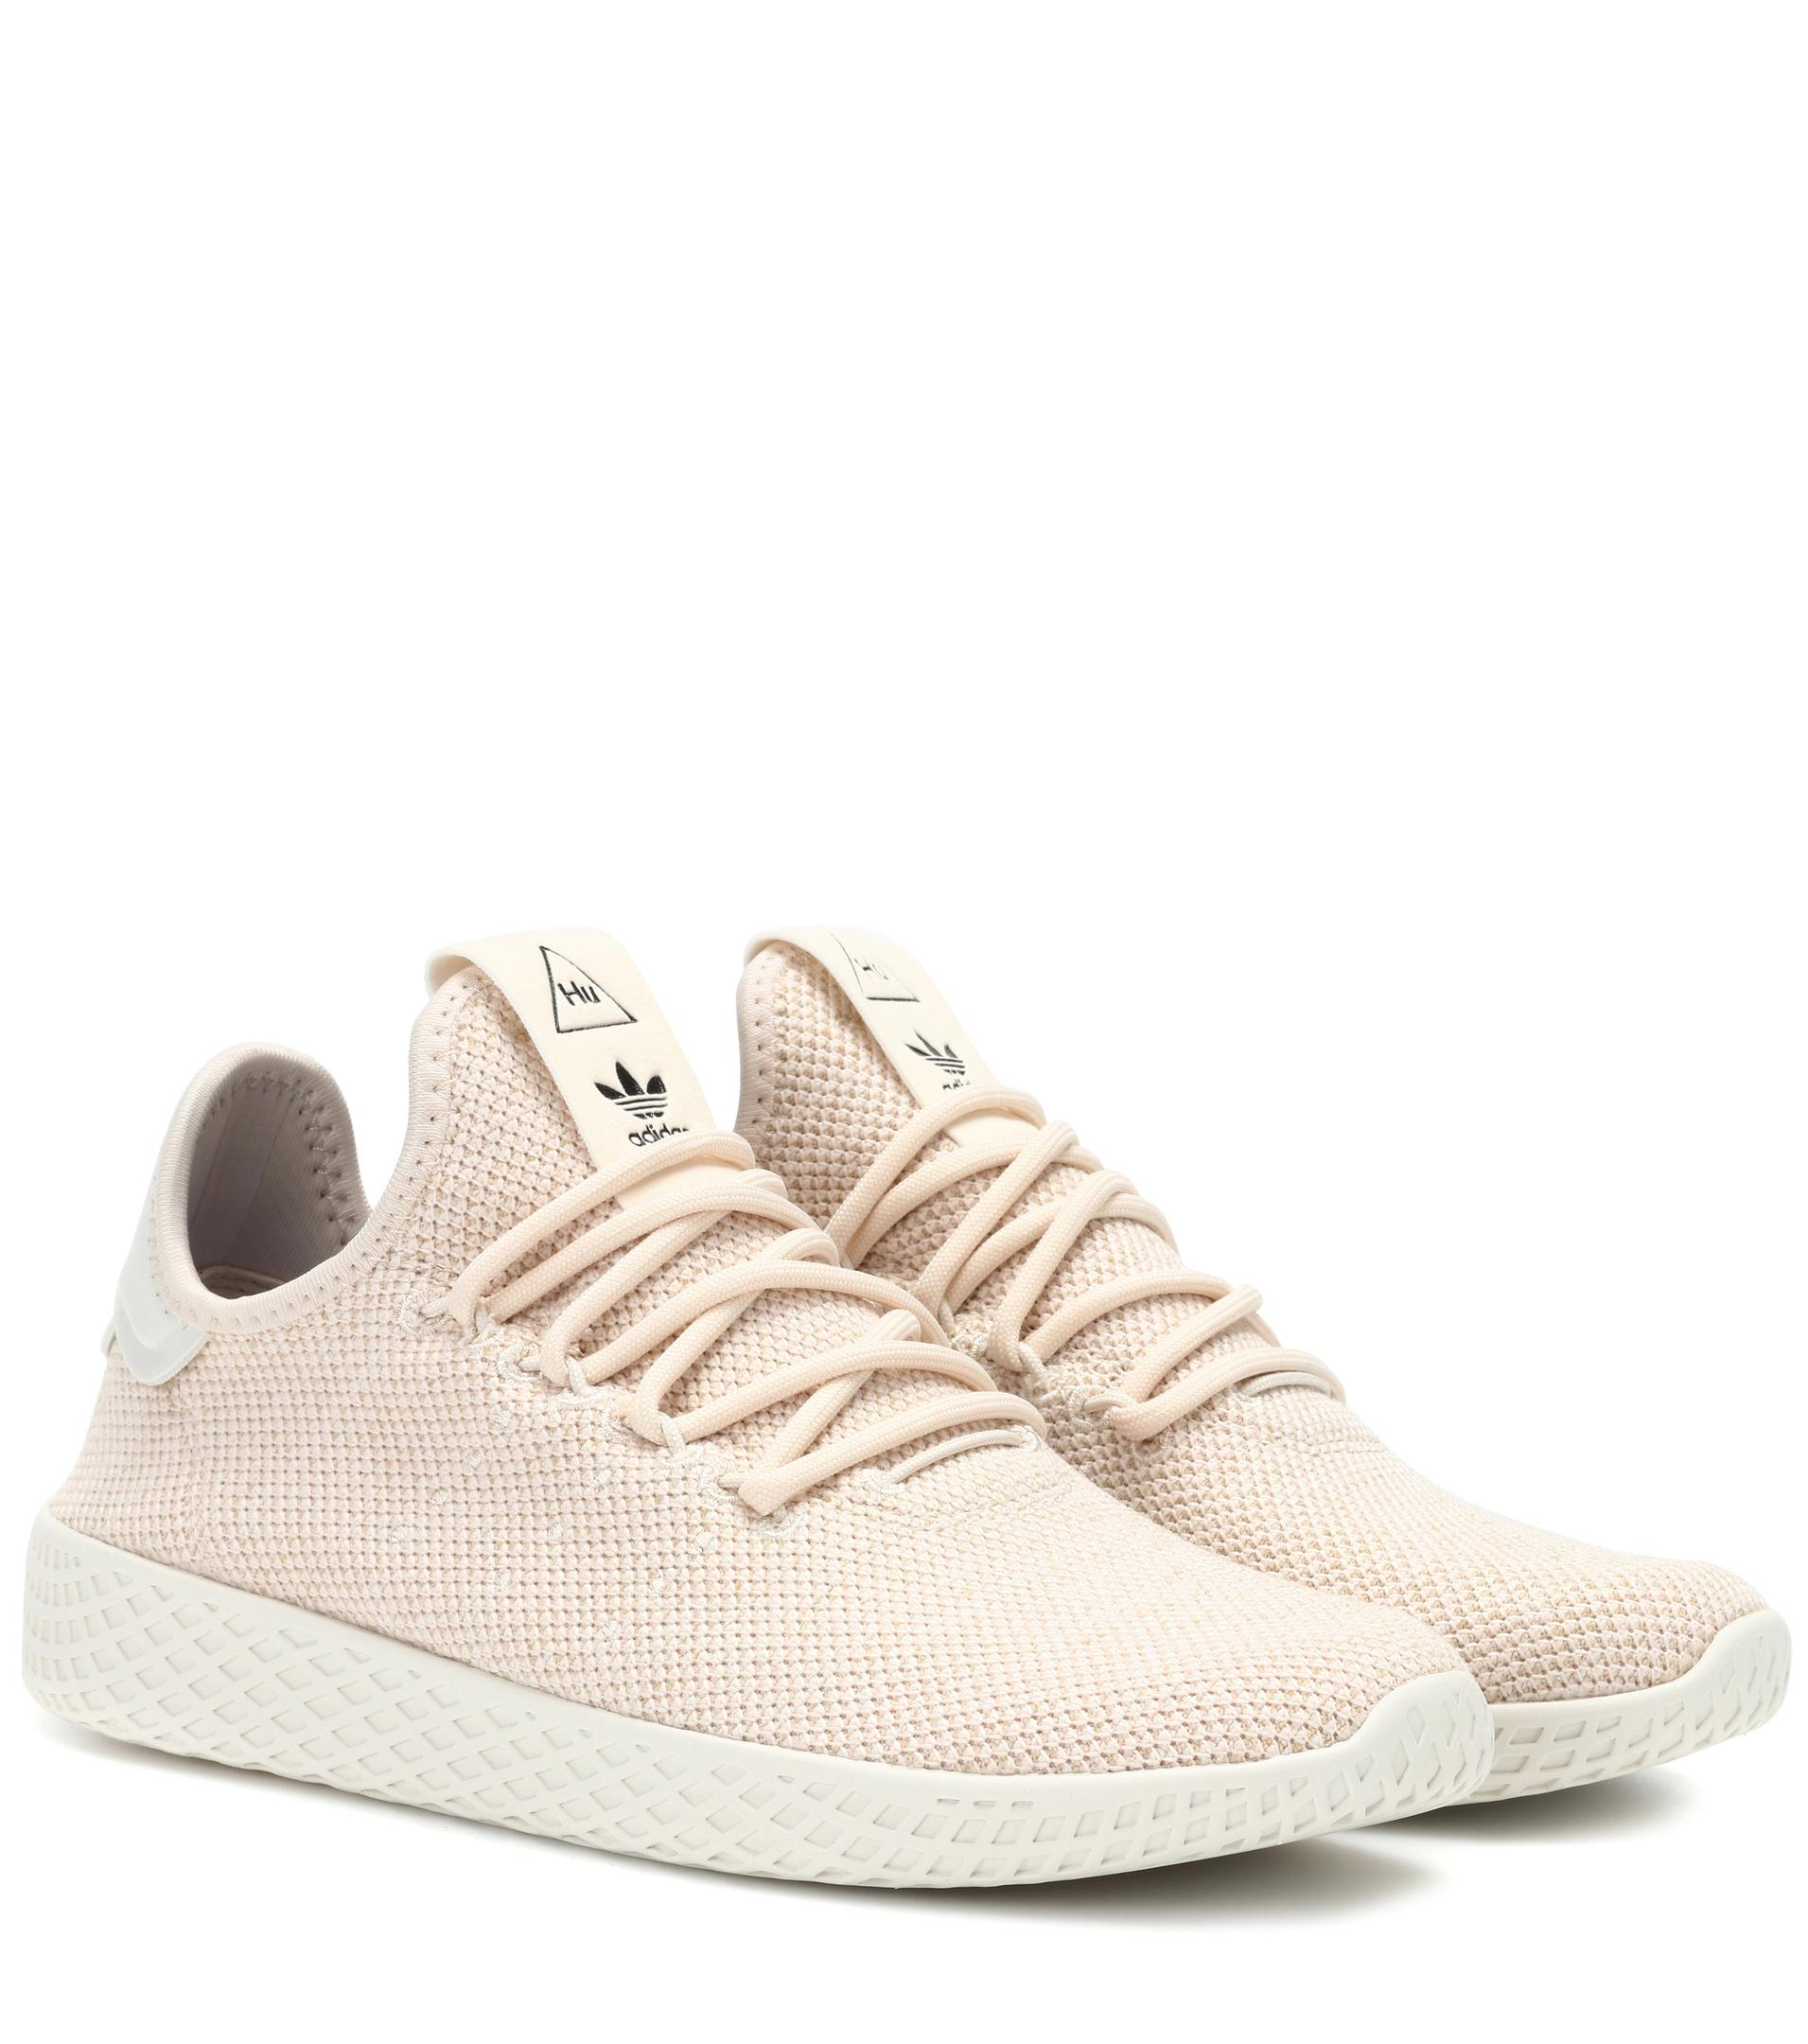 adidas Originals Pharrell Williams Tennis Hu Sneakers in Pink - Lyst 59c4fa231d